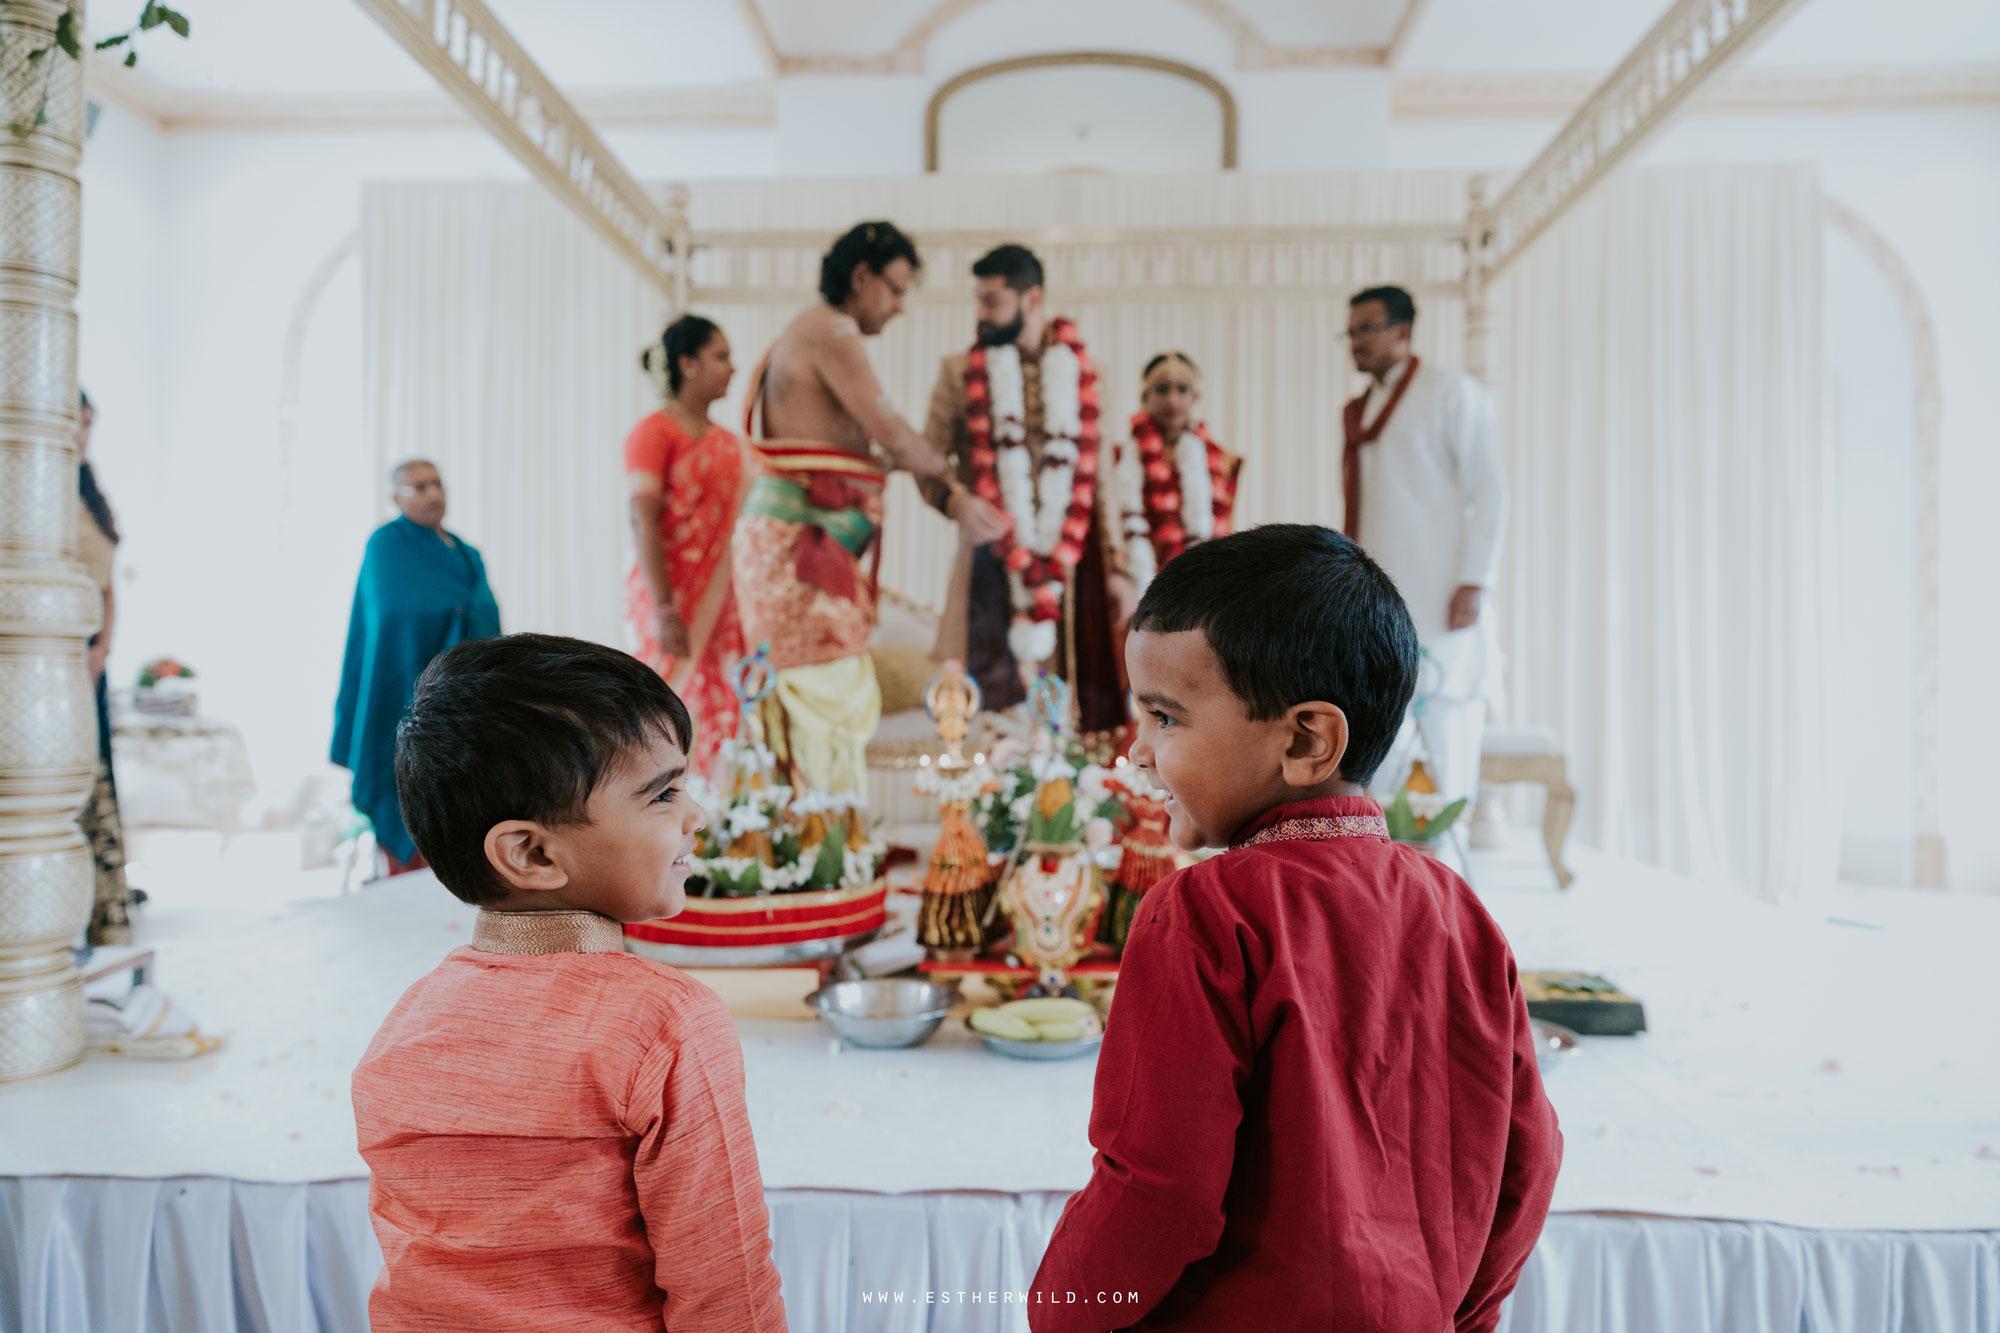 Northbrook_Park_Farnham_Surrey_London_Wedding_Hindu_Fusion_Esther_Wild_Photographer_IMG_4735.jpg